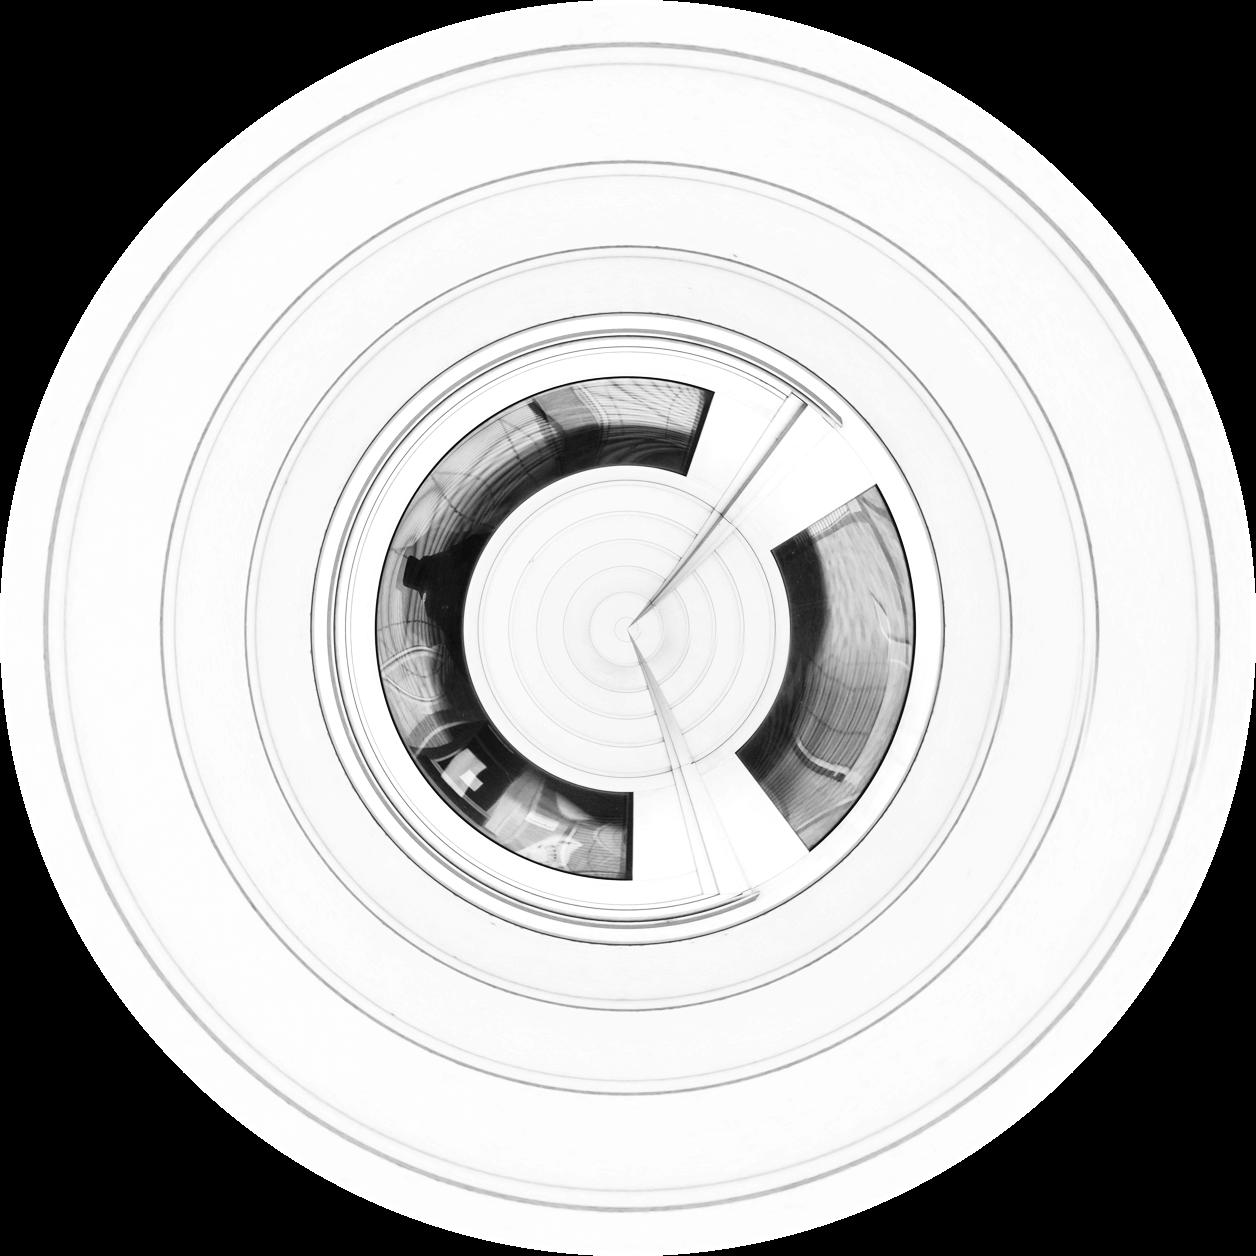 graph-wheel-2